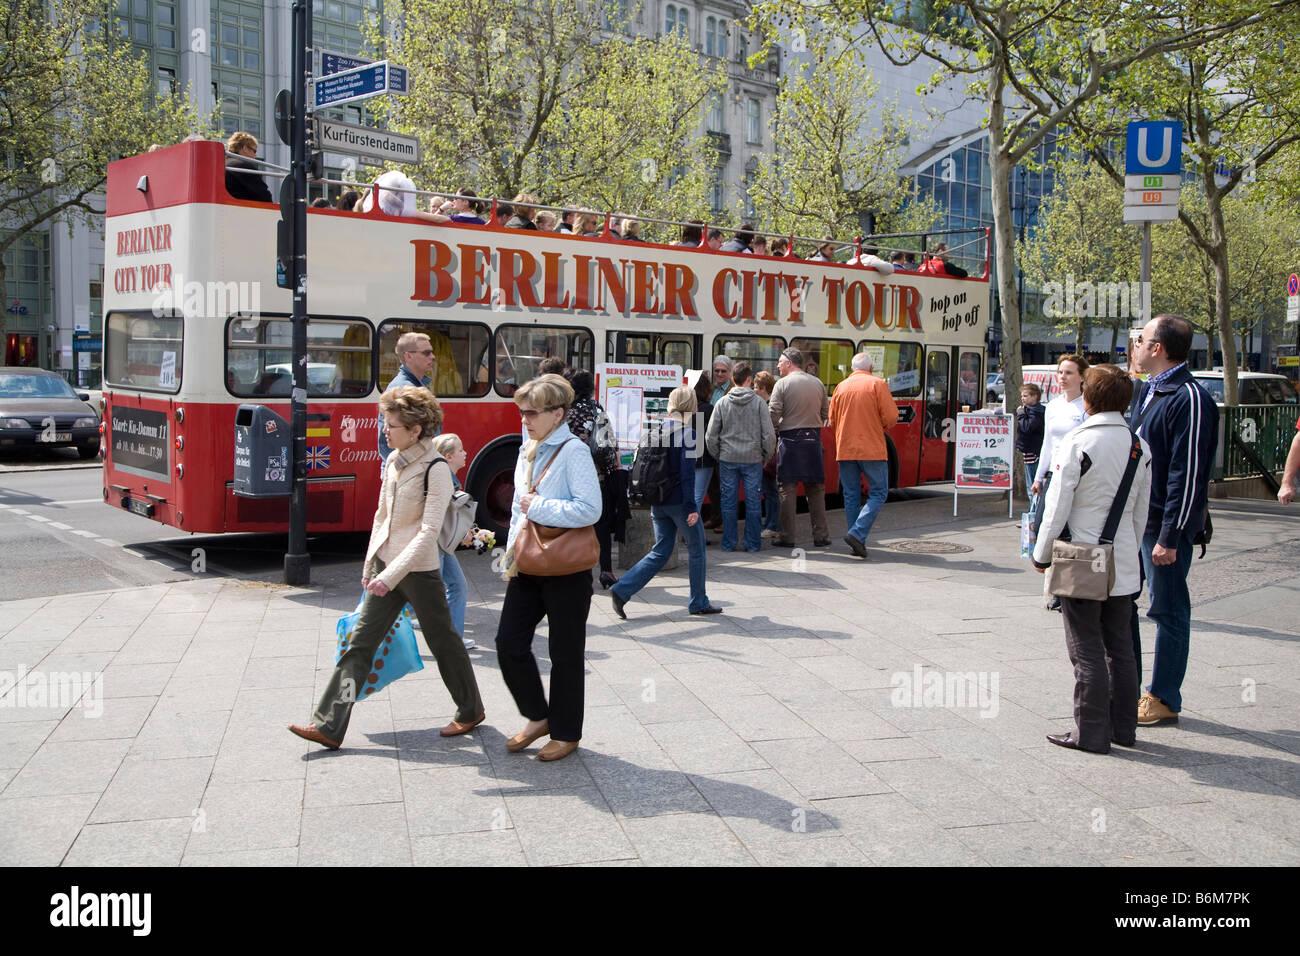 Berlin Sightseeing Bus Germany - Stock Image